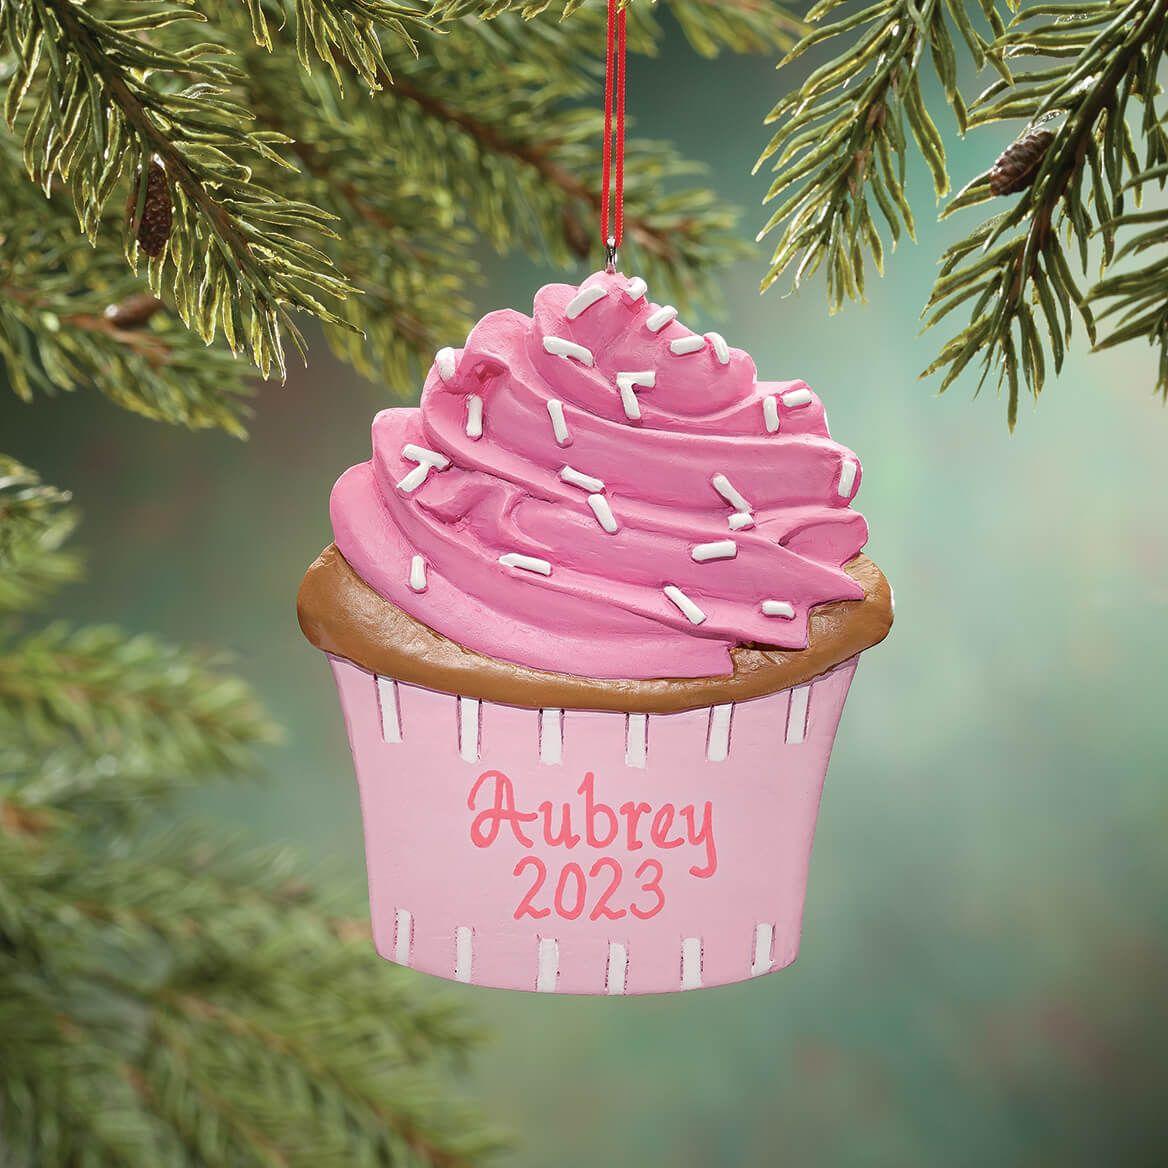 Personalized Cupcake Ornament-349263